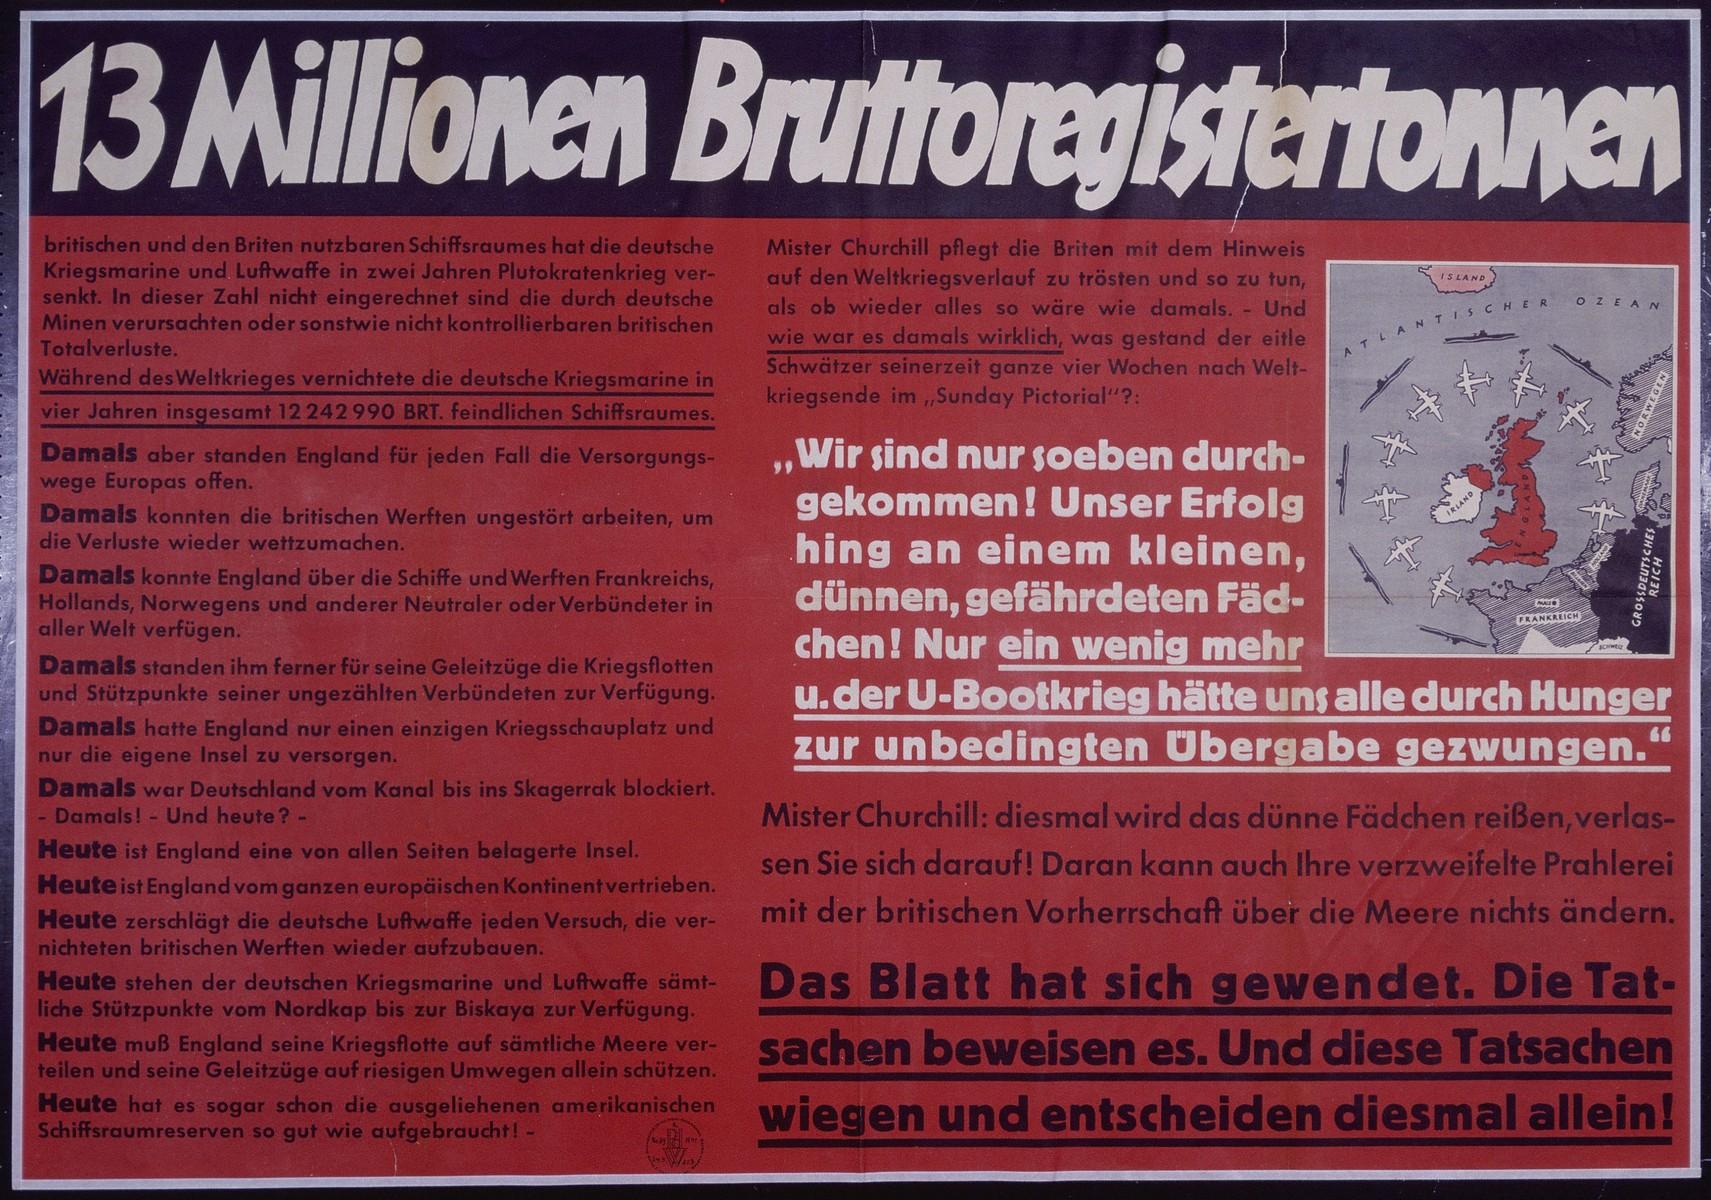 "Nazi propaganda poster entitled, ""13 Millionen Bruttoregistertonnen,"" issued by the ""Parole der Woche,"" a wall newspaper (Wandzeitung) published by the National Socialist Party propaganda office in Munich."